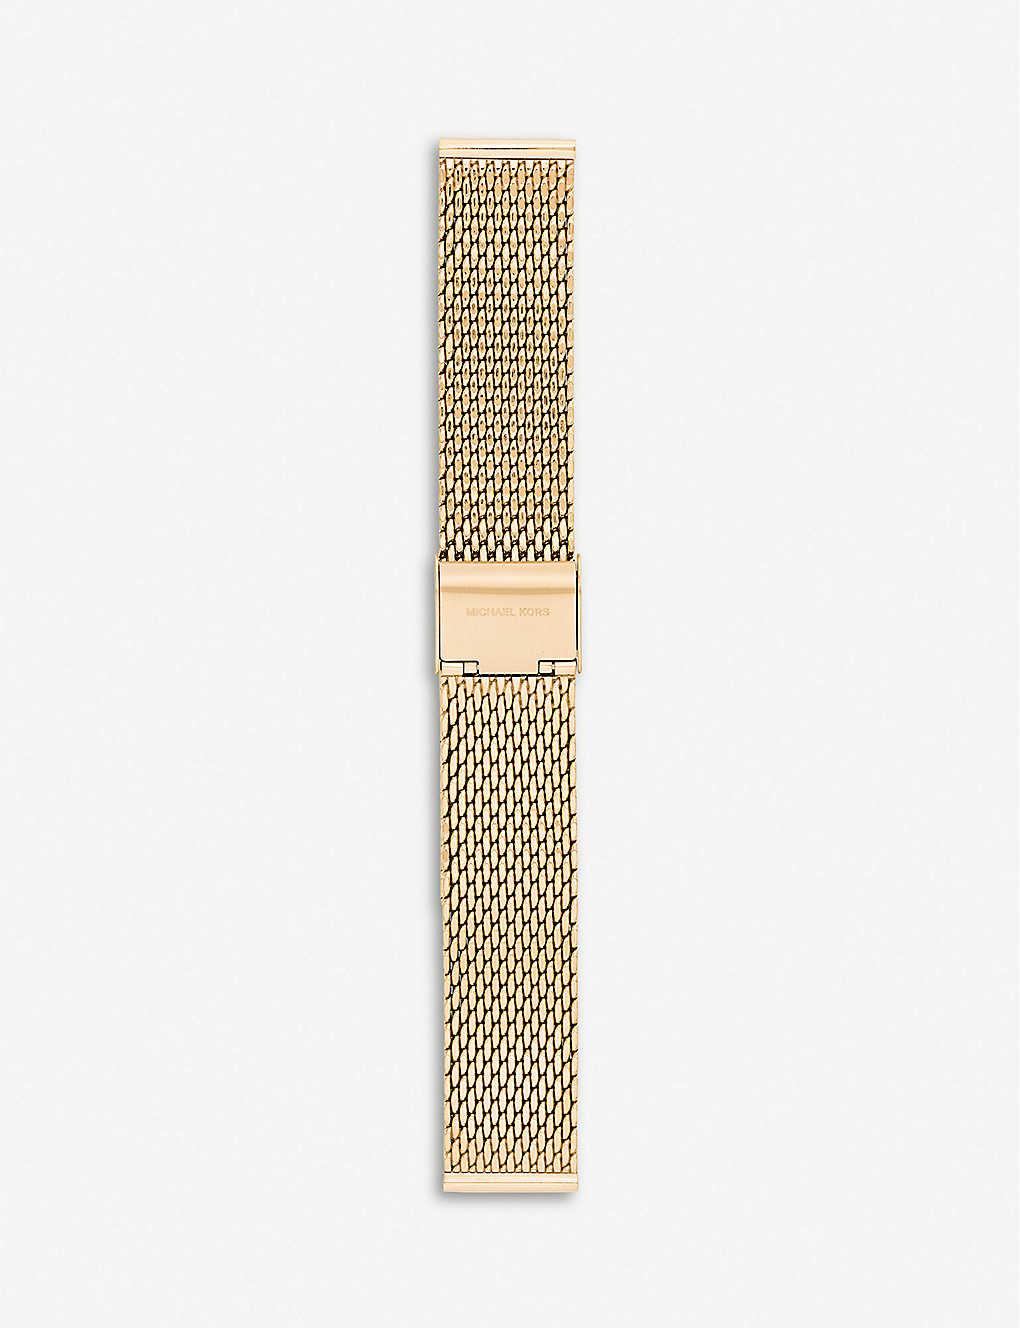 63d73de330f0 MICHAEL KORS - MKT9074 Runway yellow-gold plated stainless steel ...